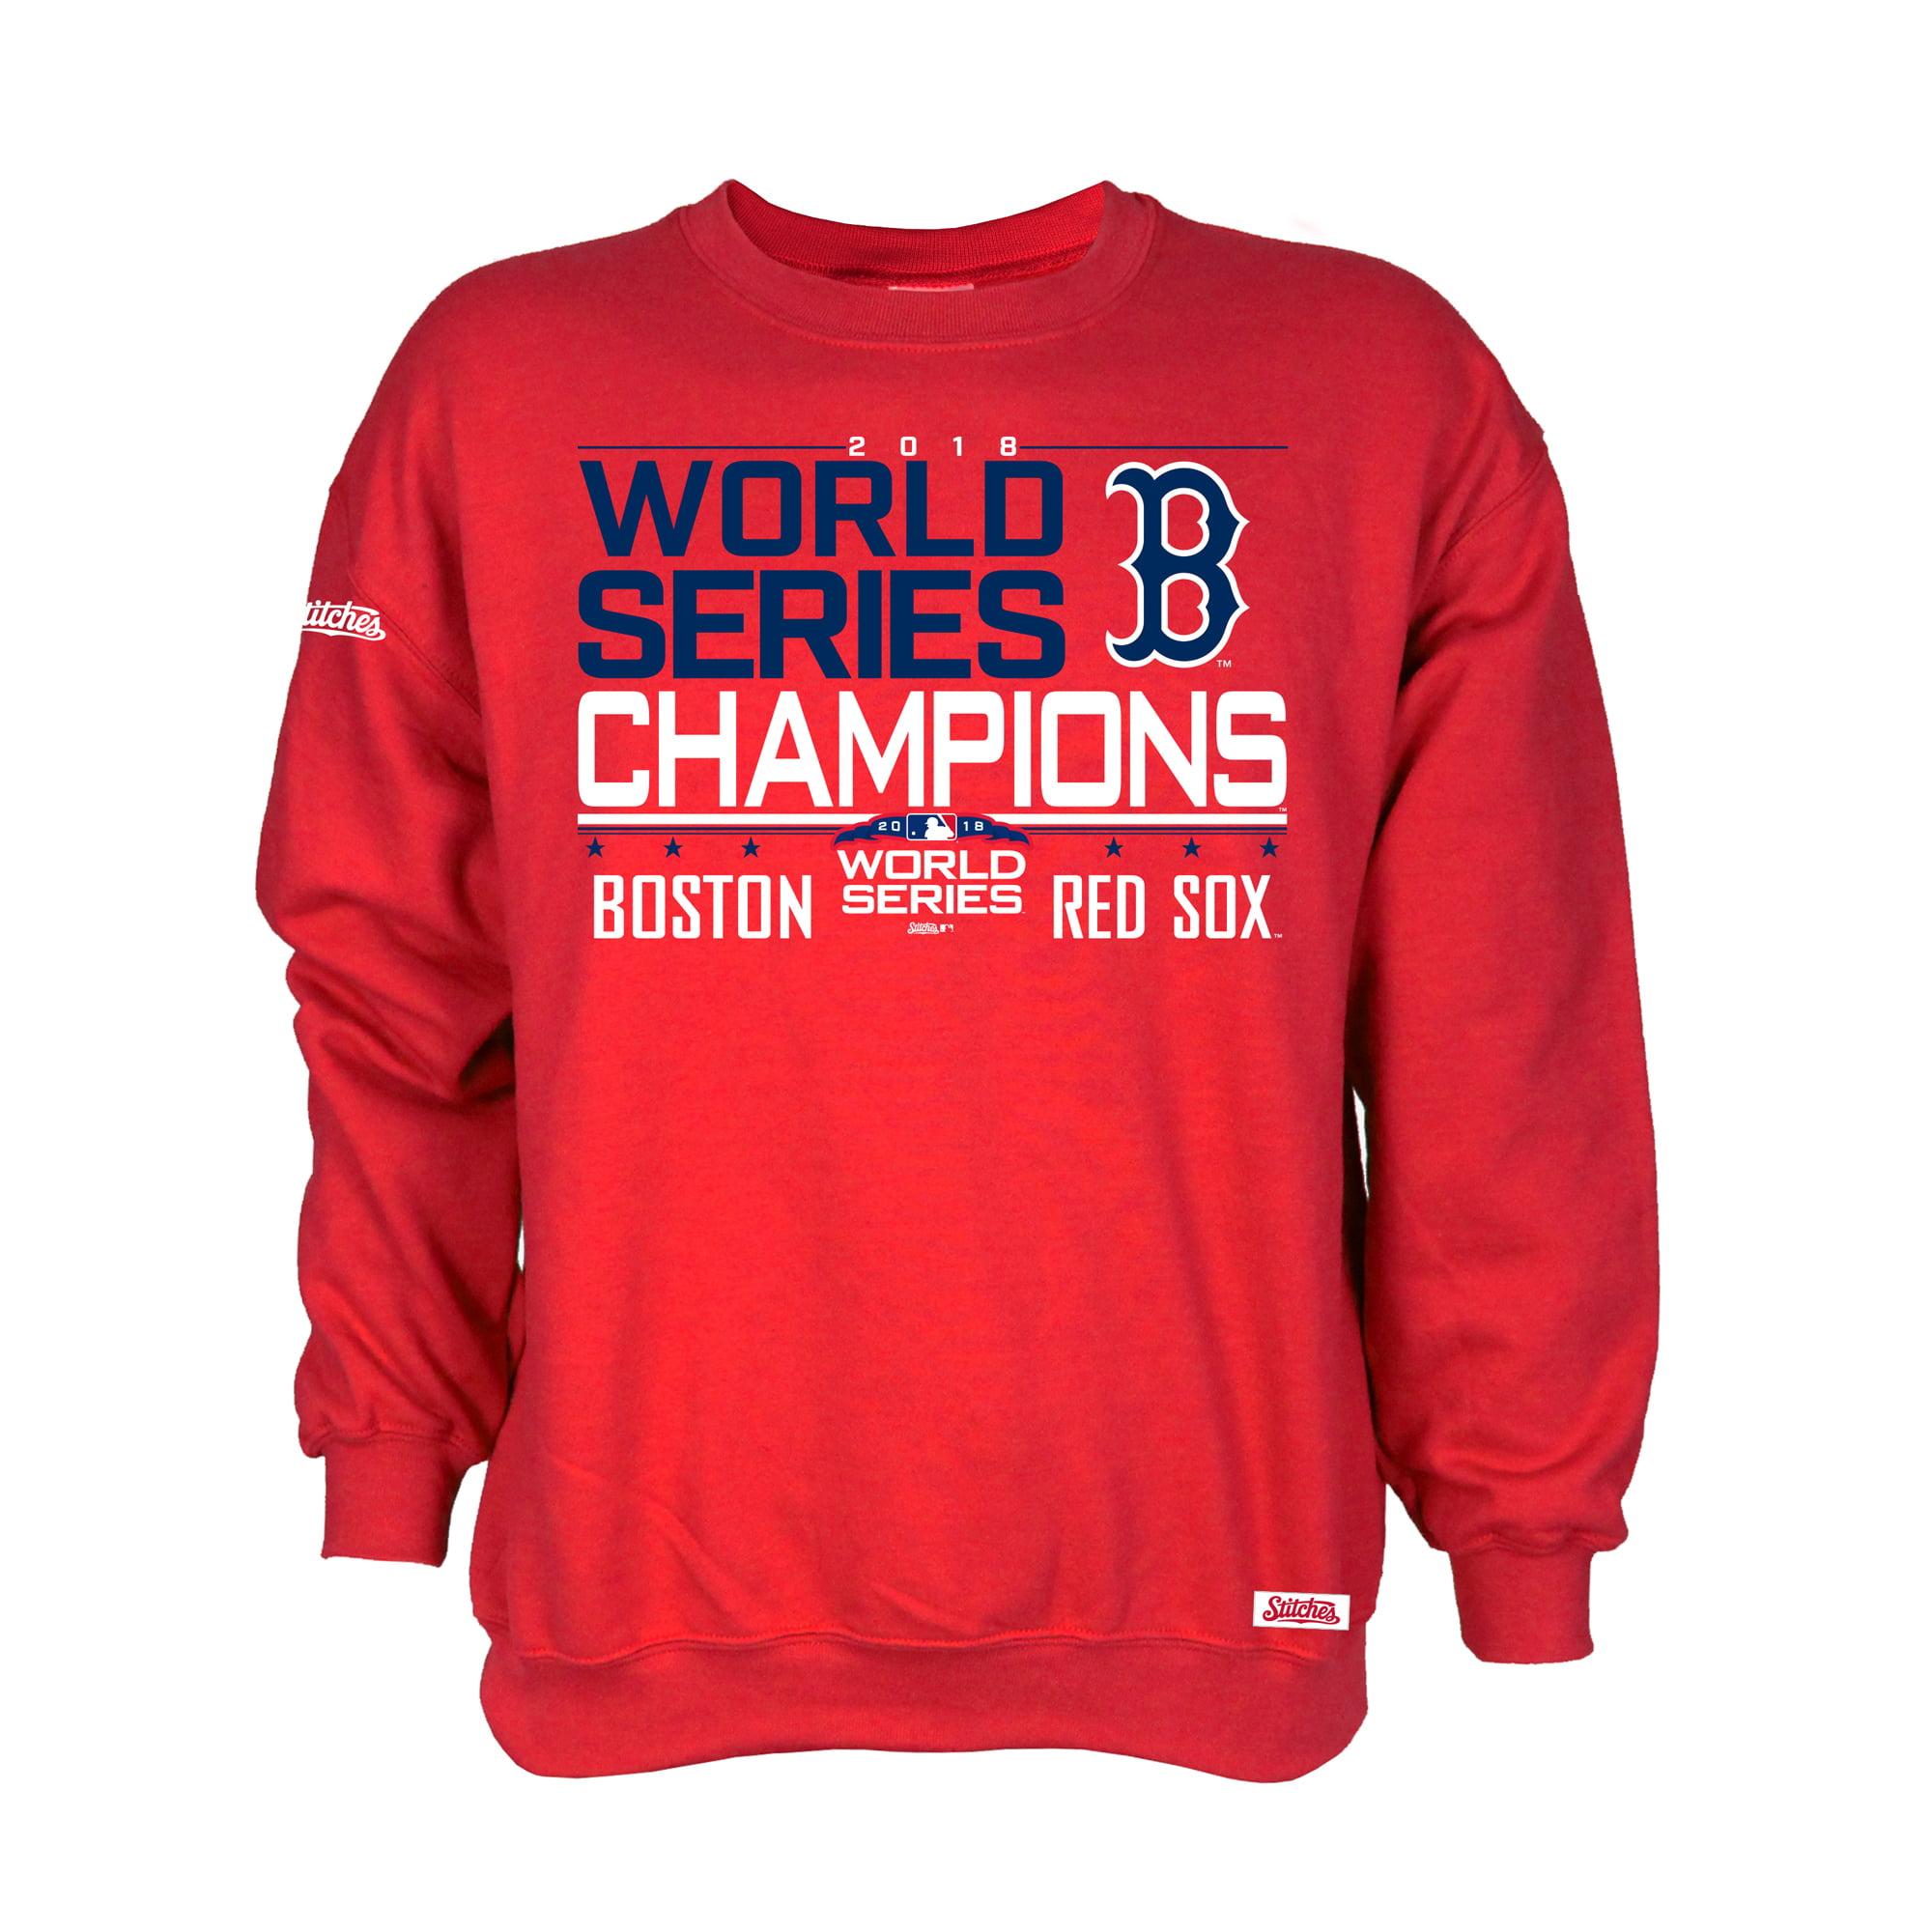 Boston Red Sox Stitches 2018 World Series Champions Pullover Crewneck Sweatshirt - Red